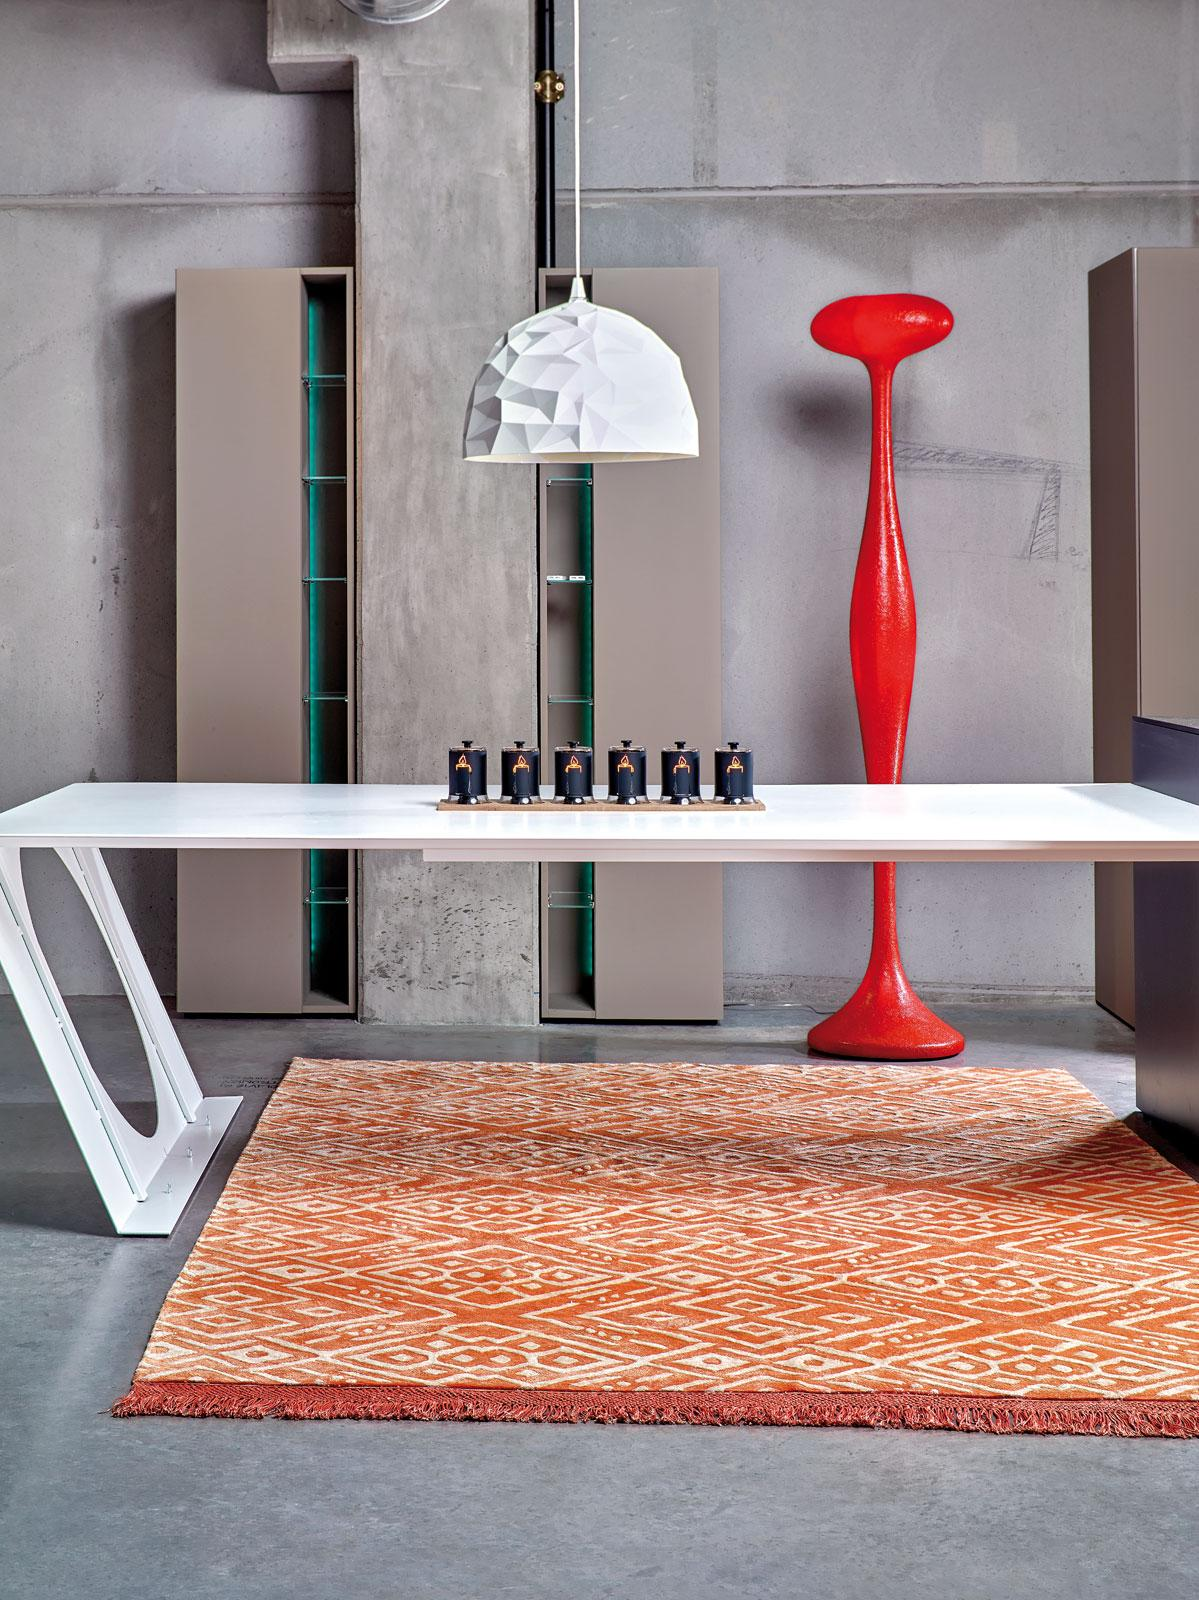 Carpet Rectangular Silk Orange Fuchsia Prices Yacht Furniture Store Design  Made In Italy Manufacturer Online Shop